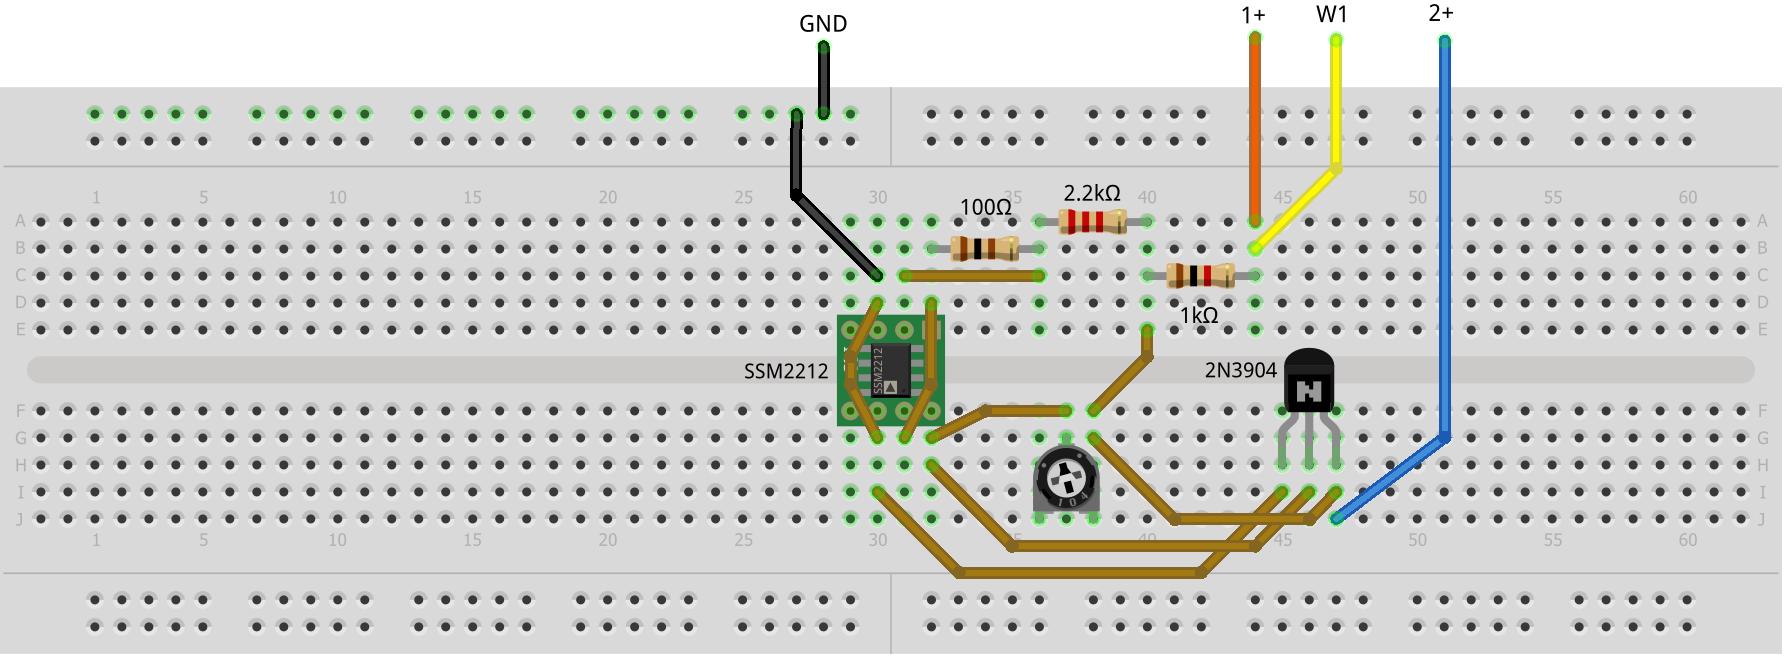 Activity 10 Shunt Regulator Analog Devices Wiki Jigmod Electronic Circuit Building System Electronicslab Hardware Setup